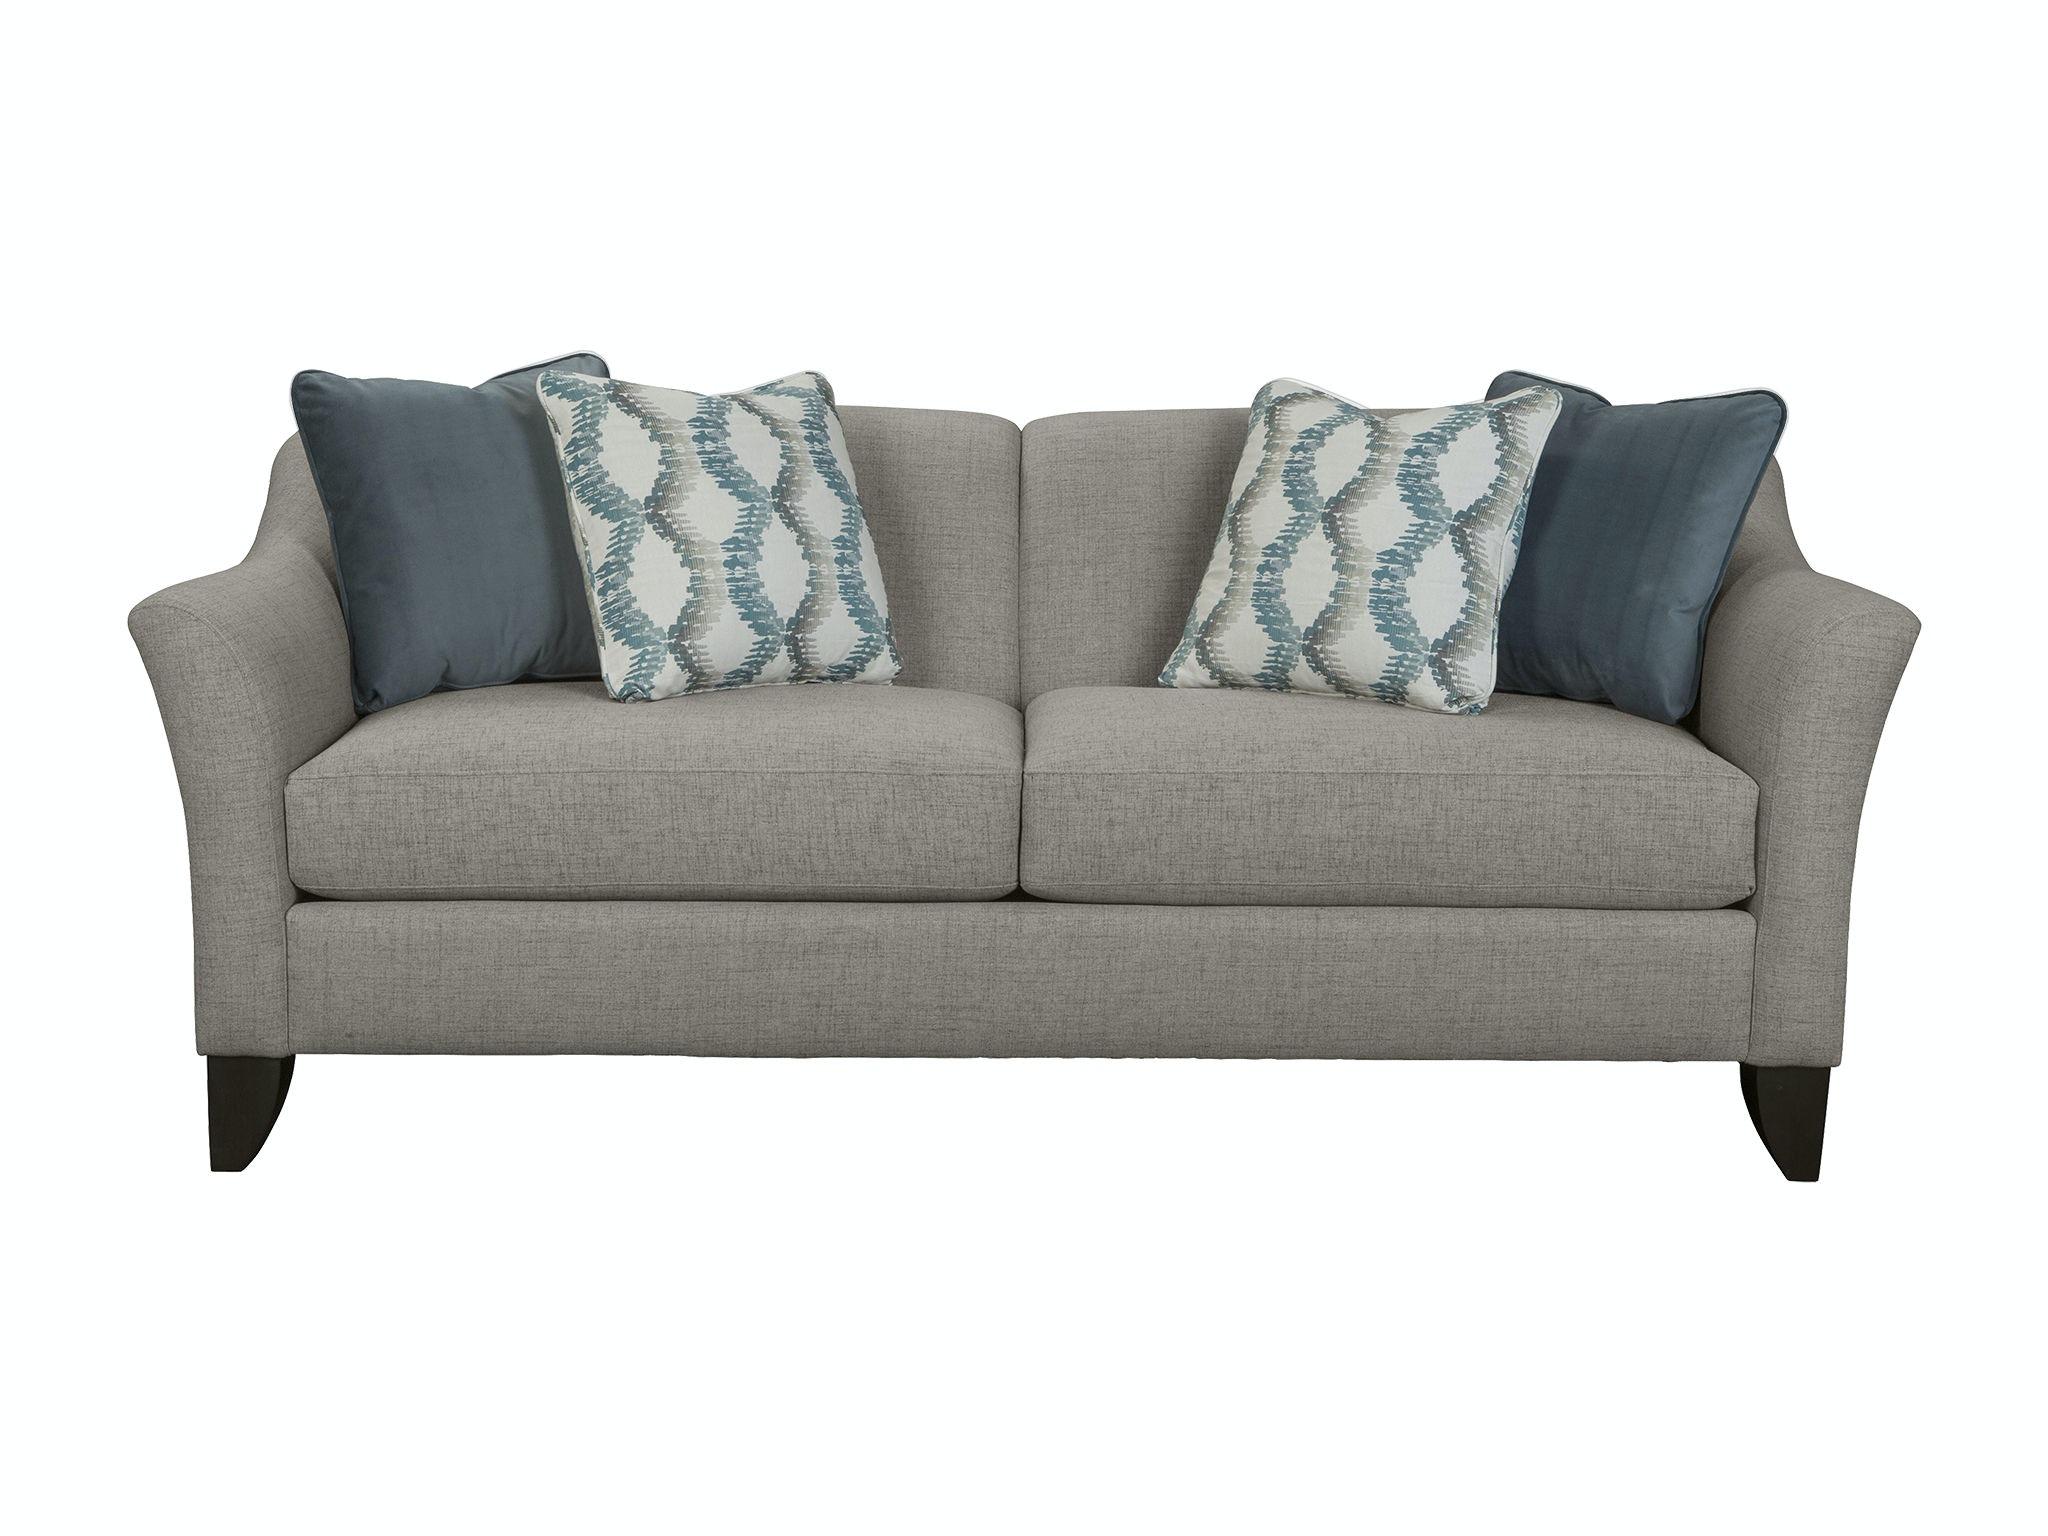 Exceptional Cozy Life Sofa 774350 ...